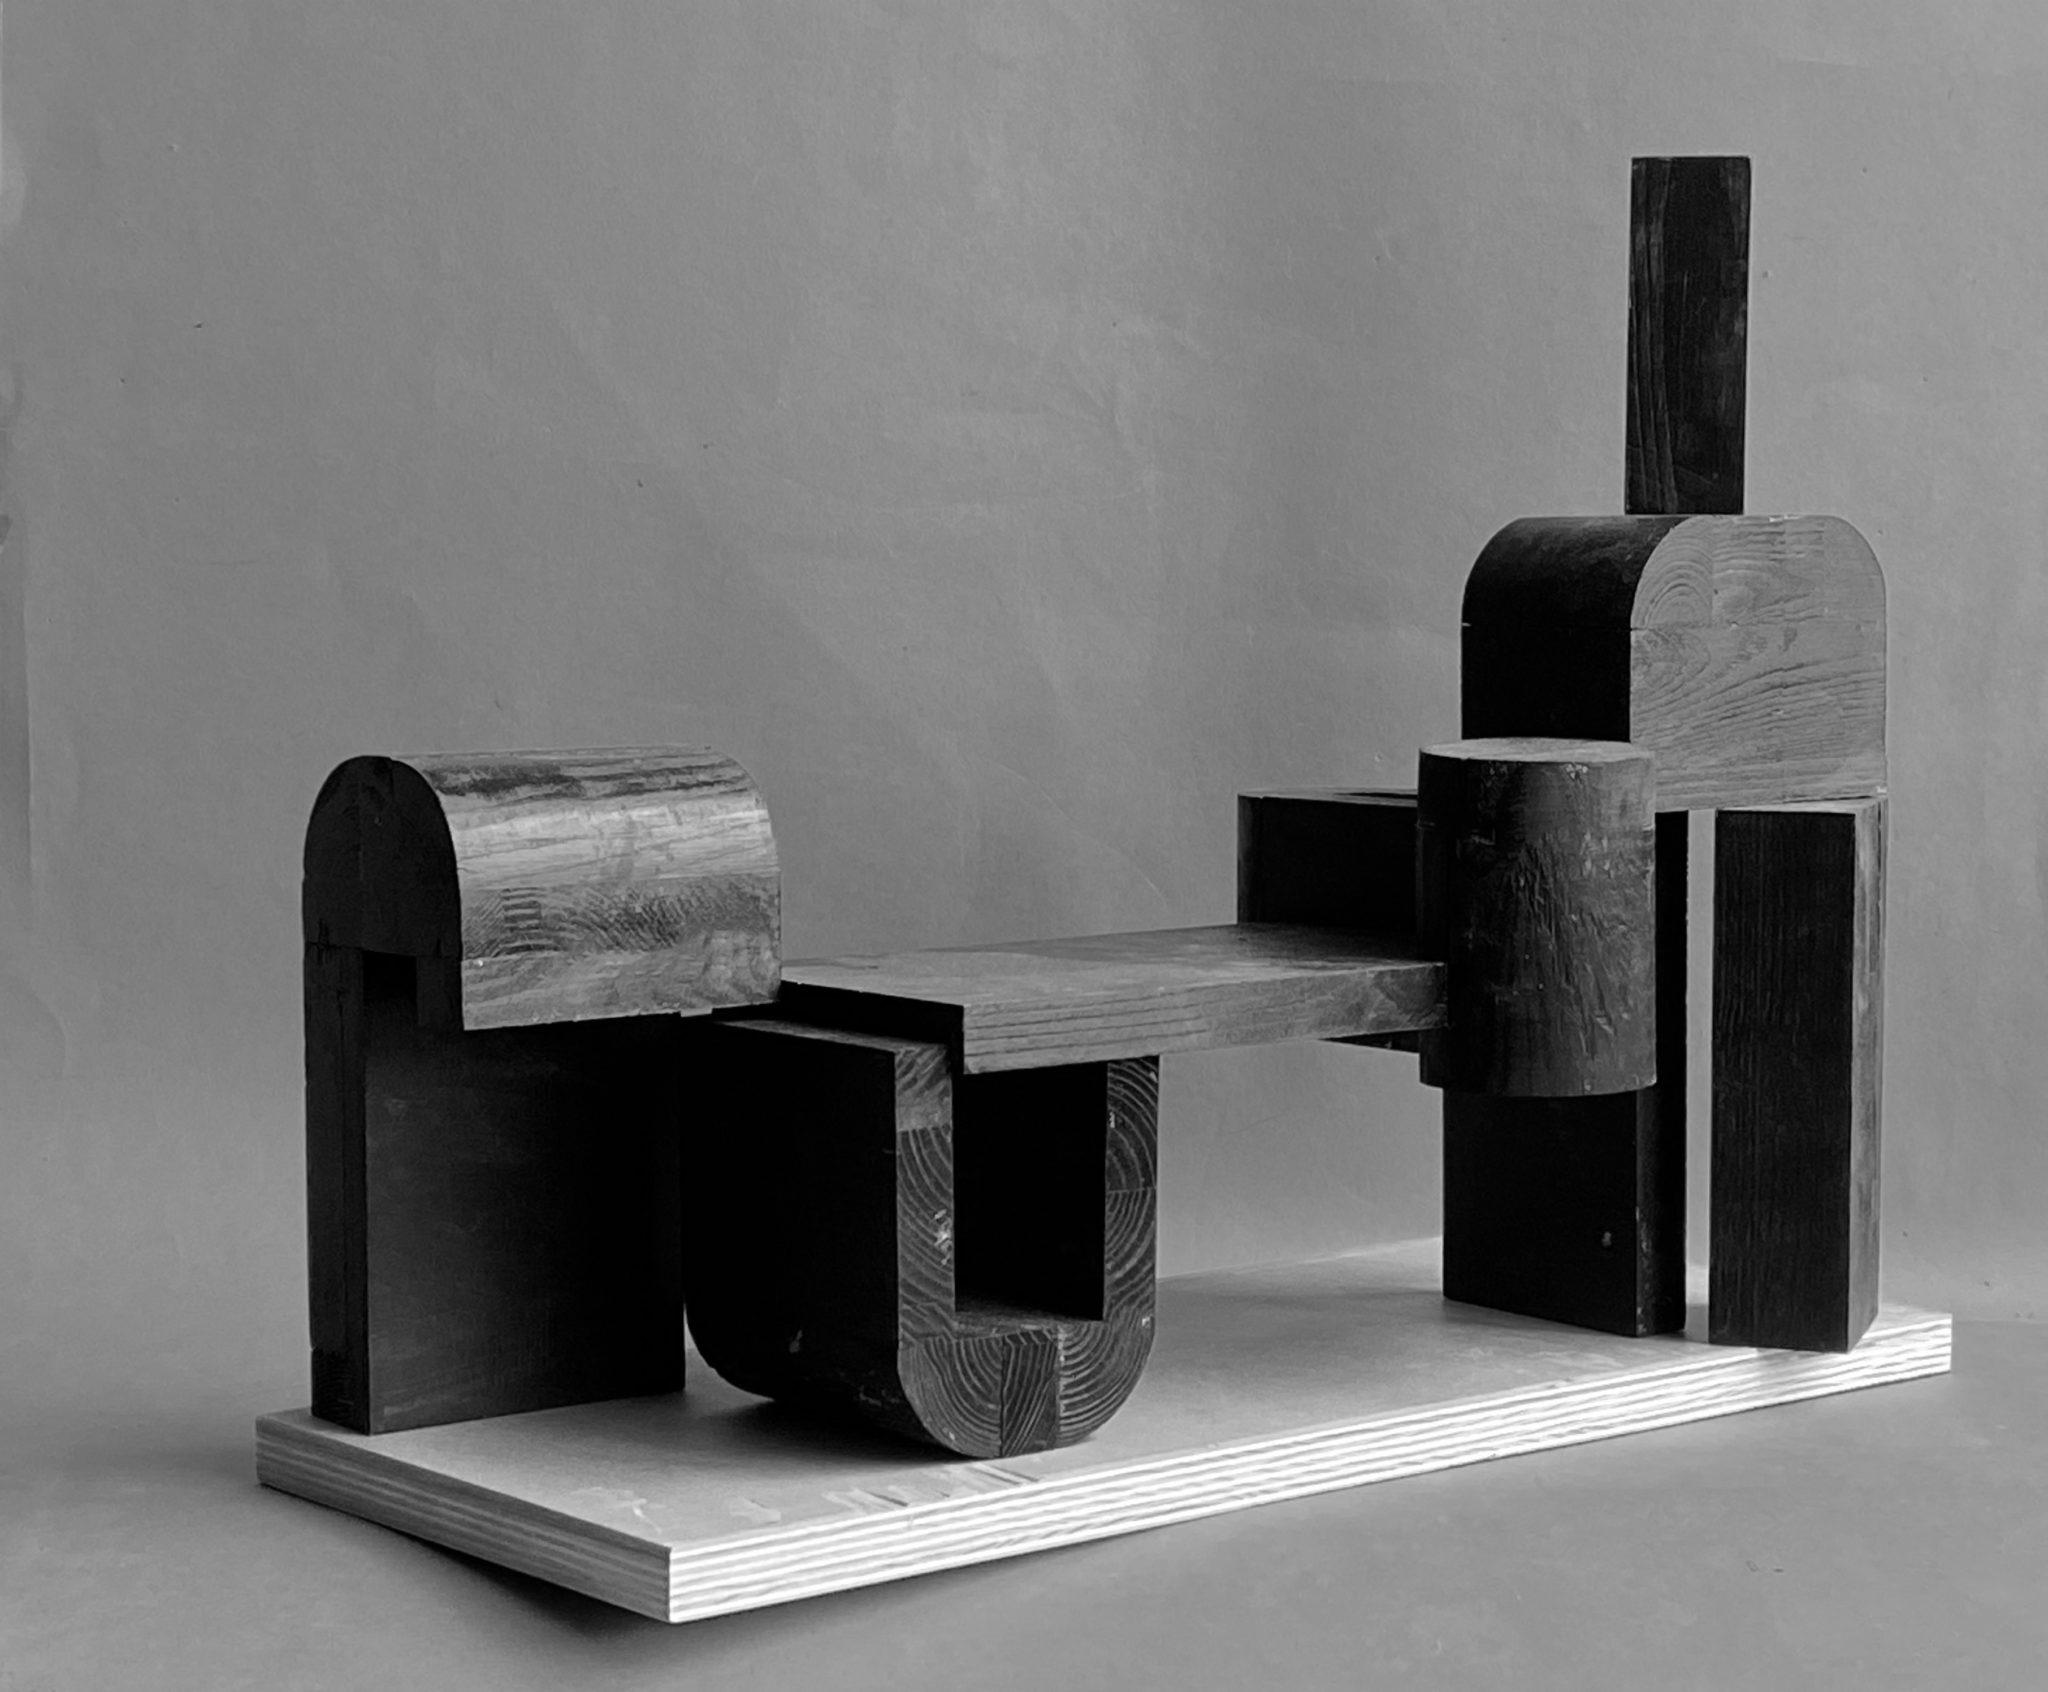 Mater Architectura III